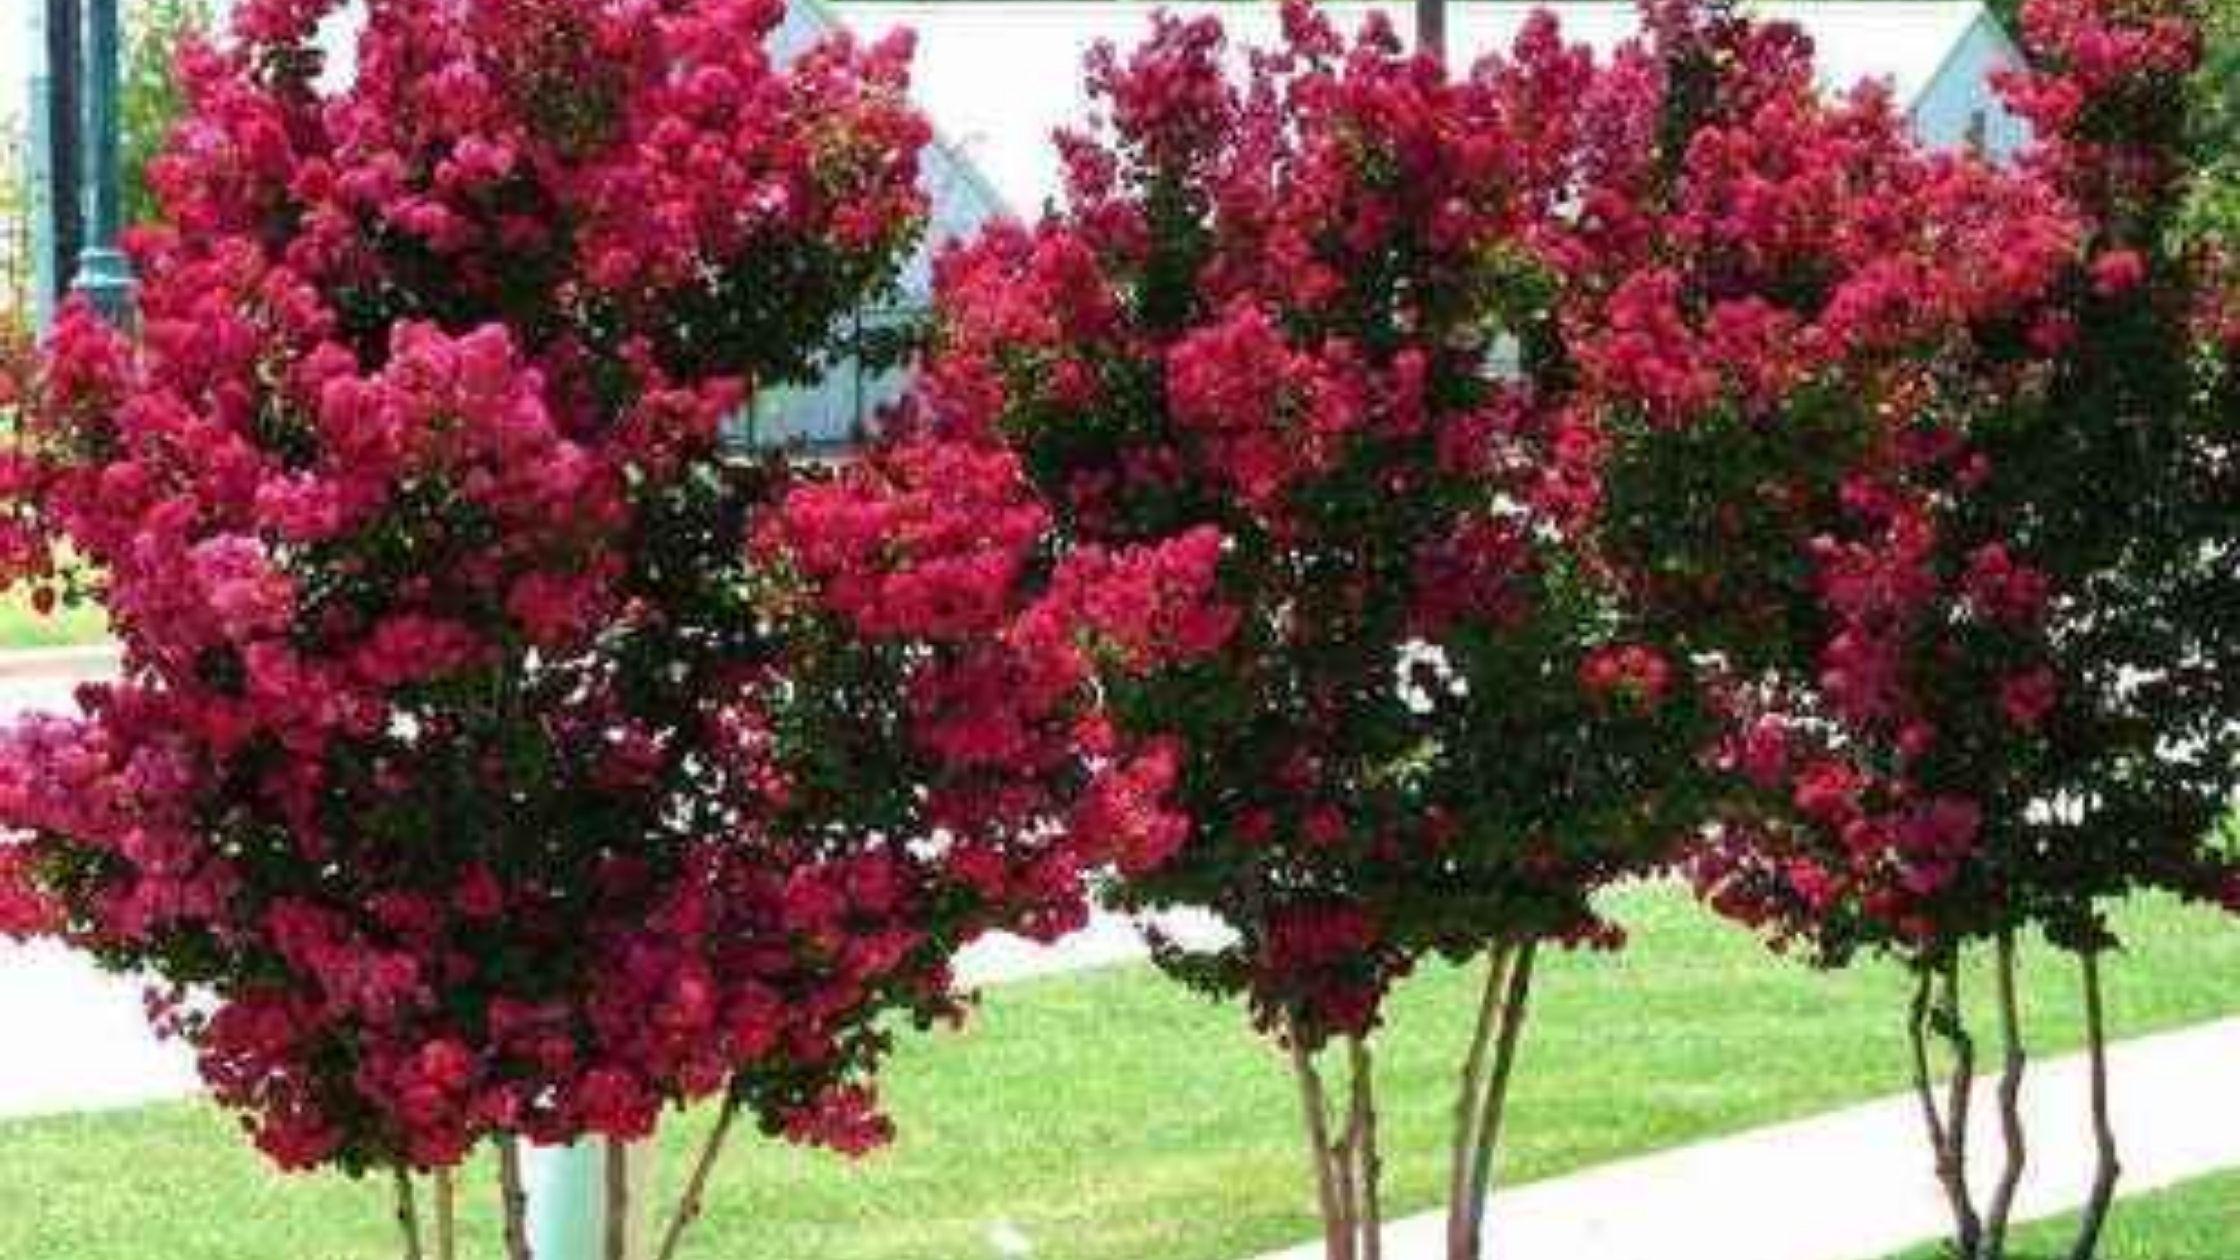 Flowering Plants at Tennessee Wholesale Nursery